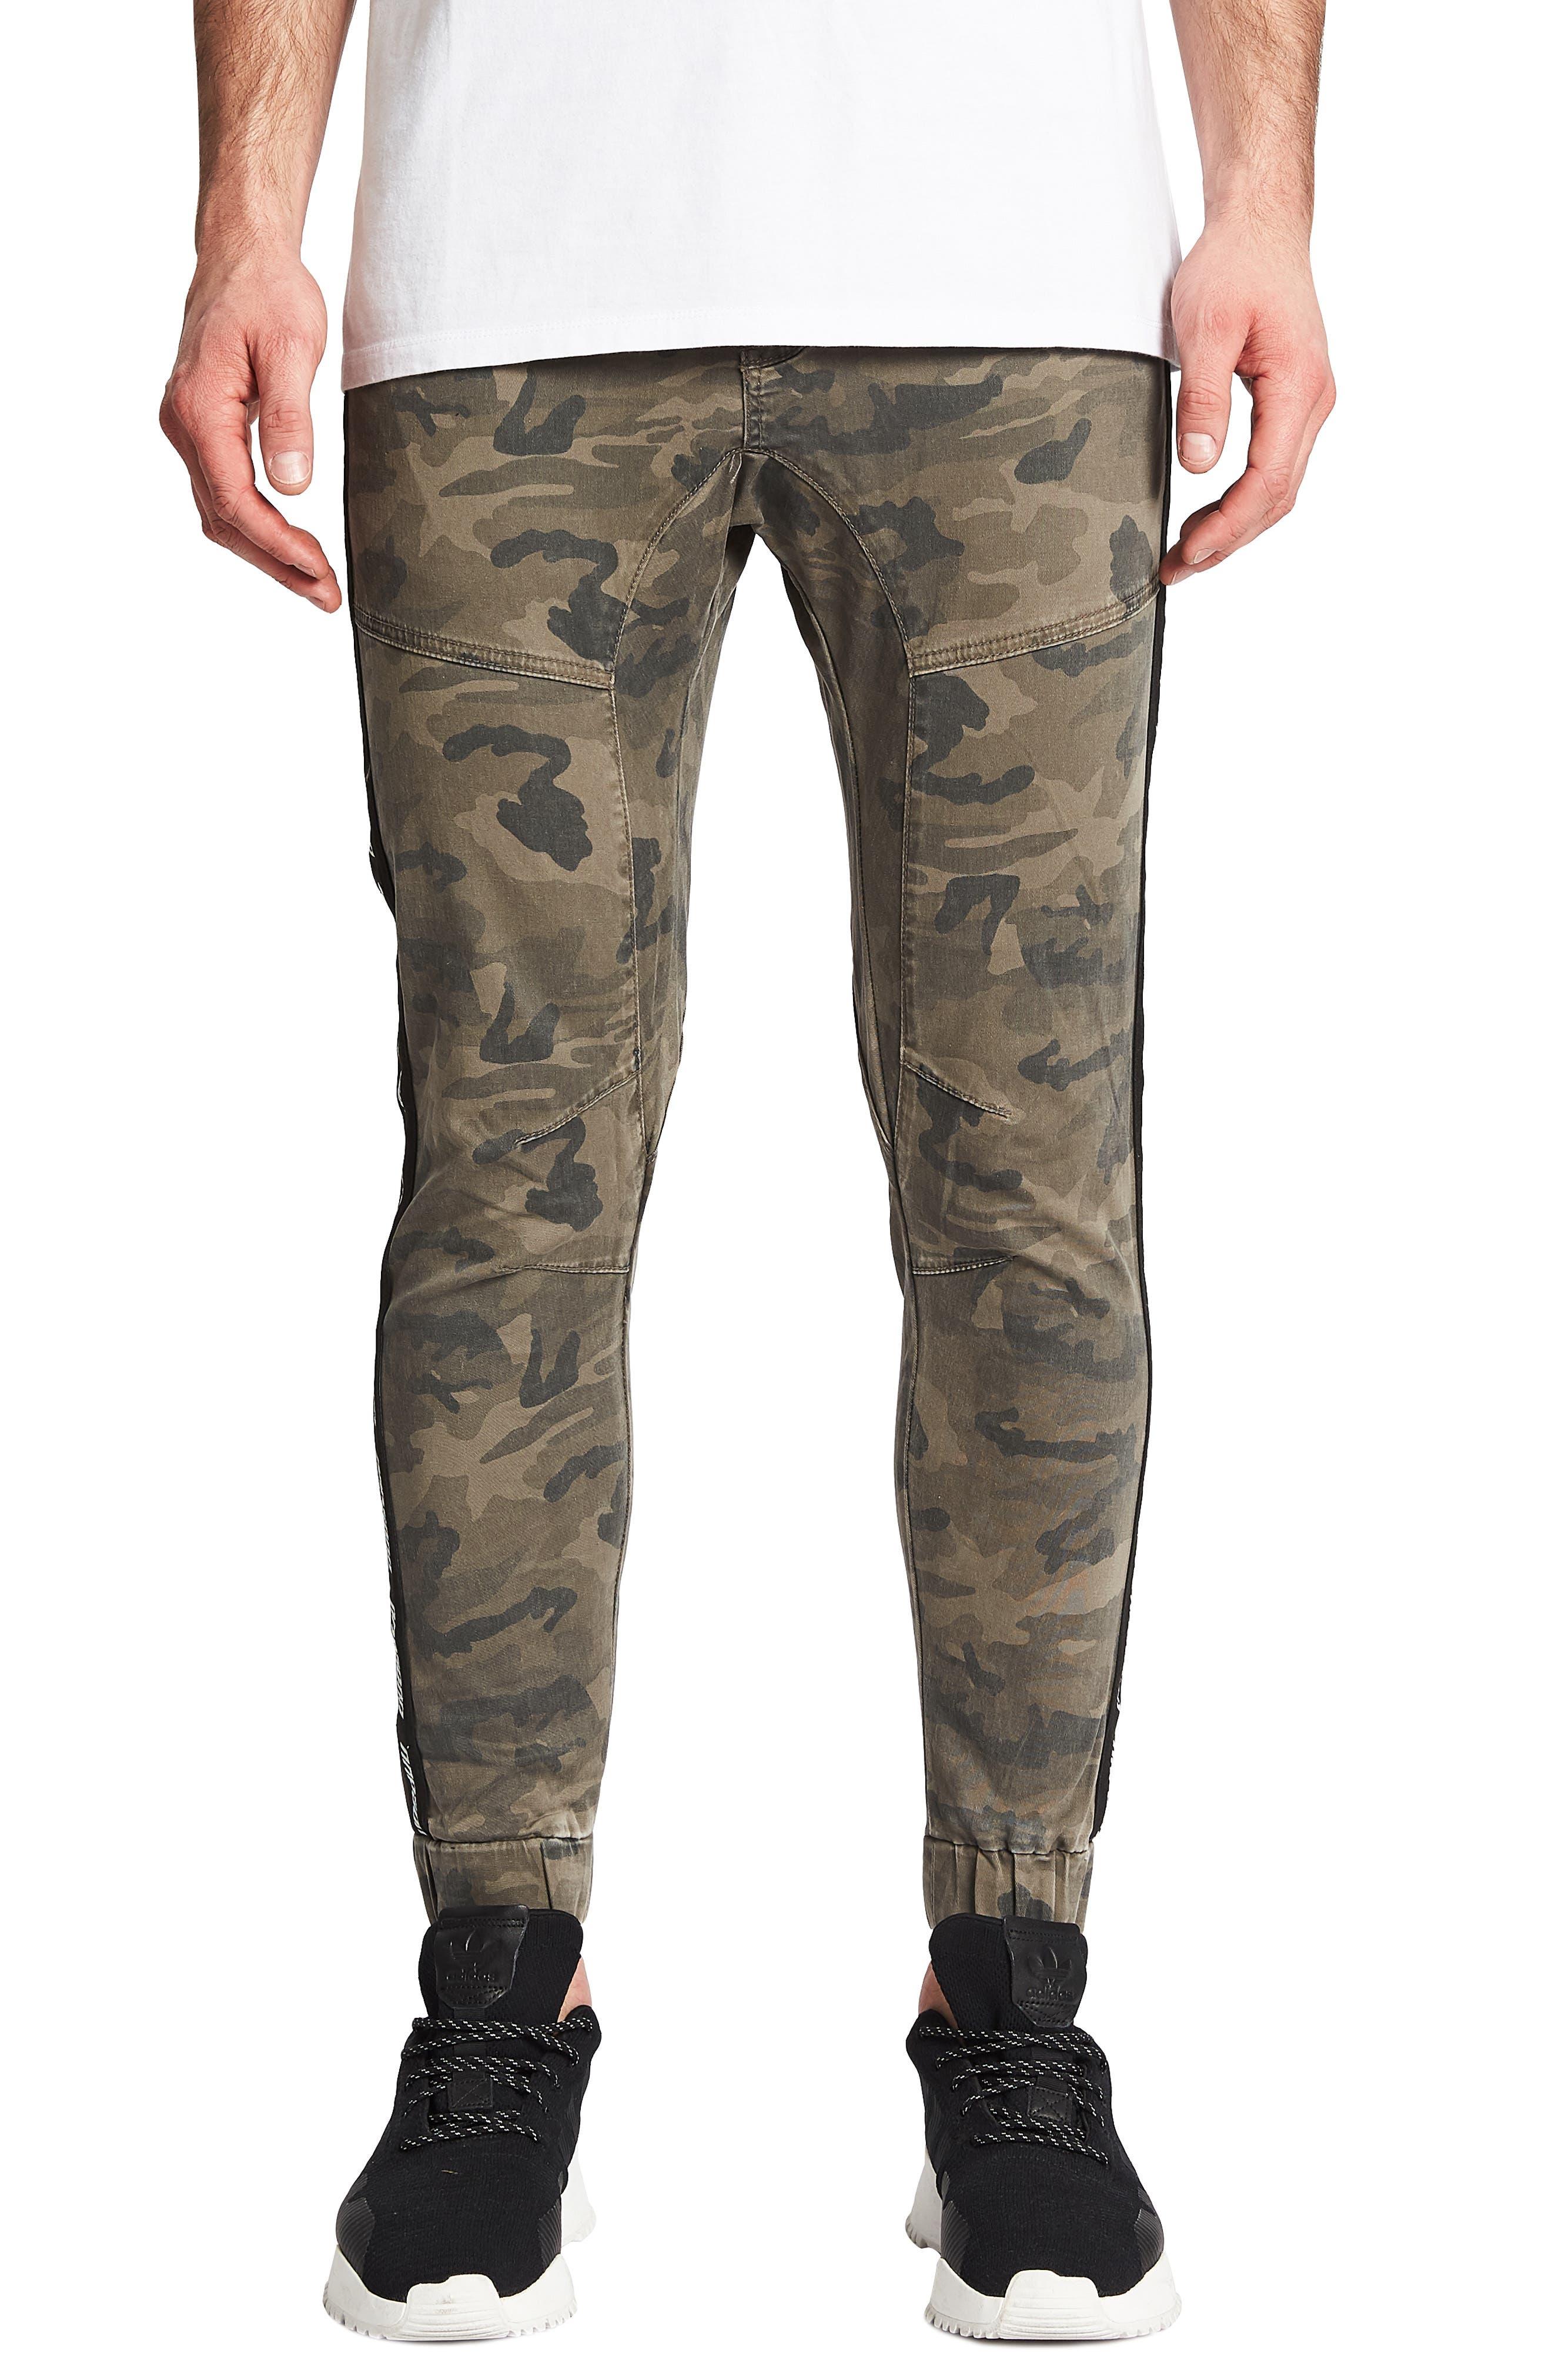 Firebrand Slim Fit Pants,                             Main thumbnail 1, color,                             AIRWOLF CAMO